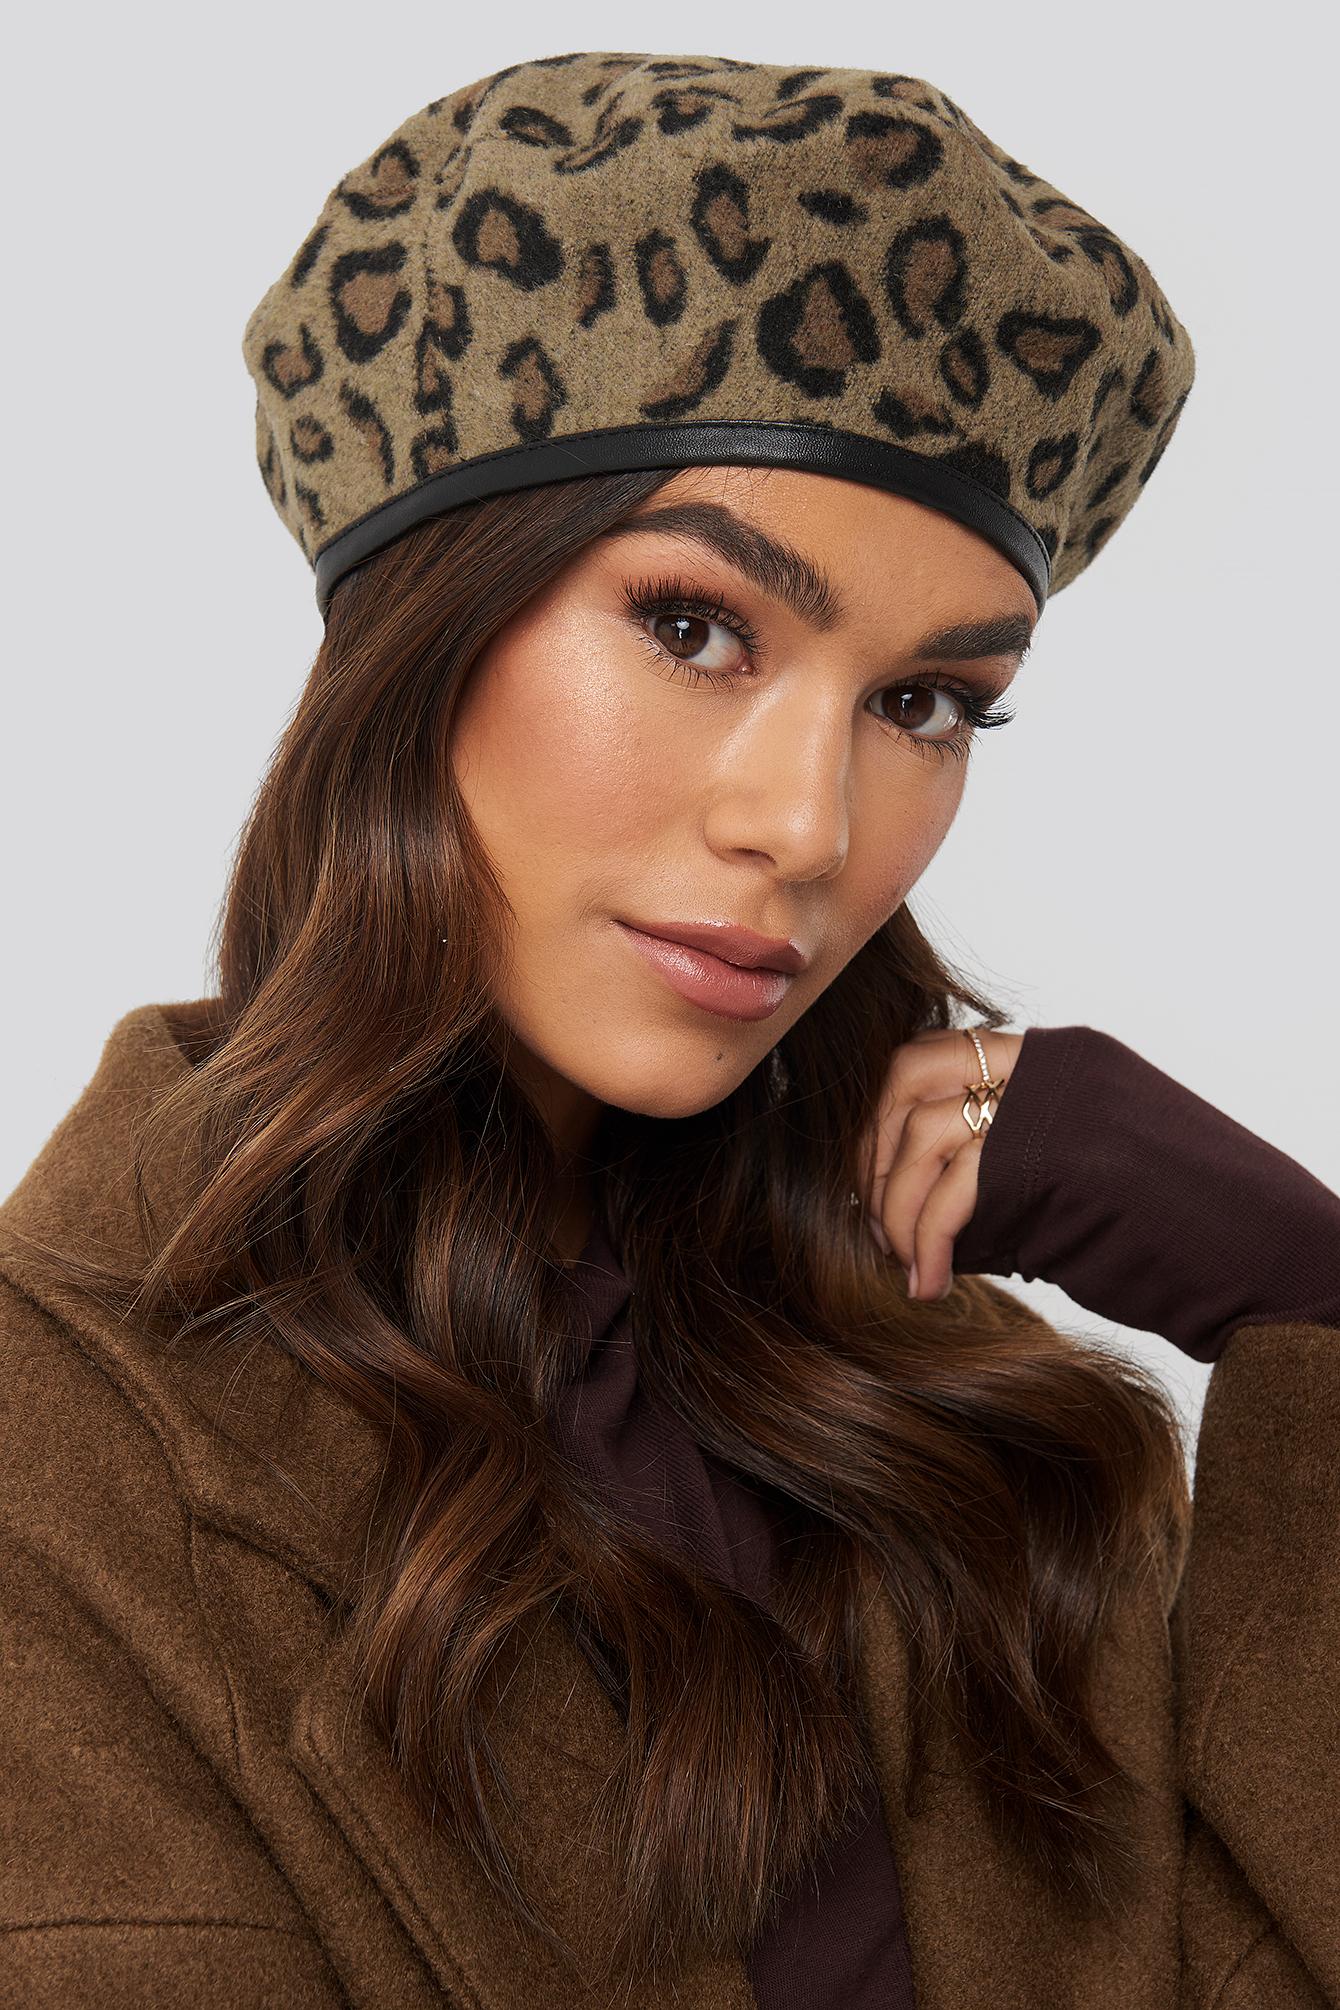 NA-KD Accessories Leopard Beret Hat - Multicolor | Accessoires > Mützen > Sonstige Mützen | NA-KD Accessories